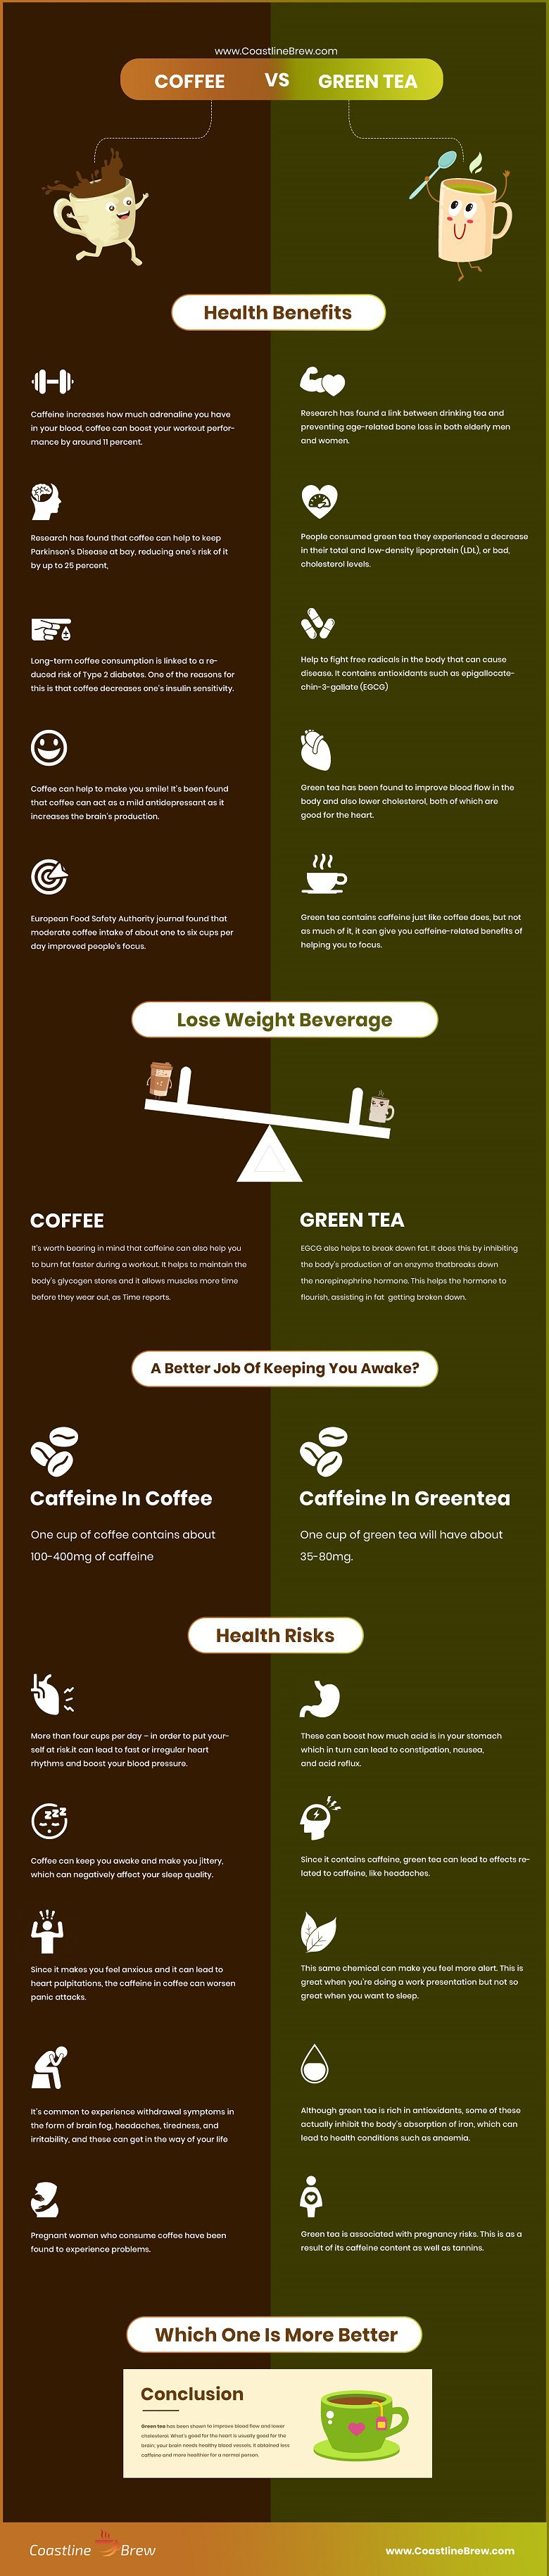 Coffee Vs Green Tea